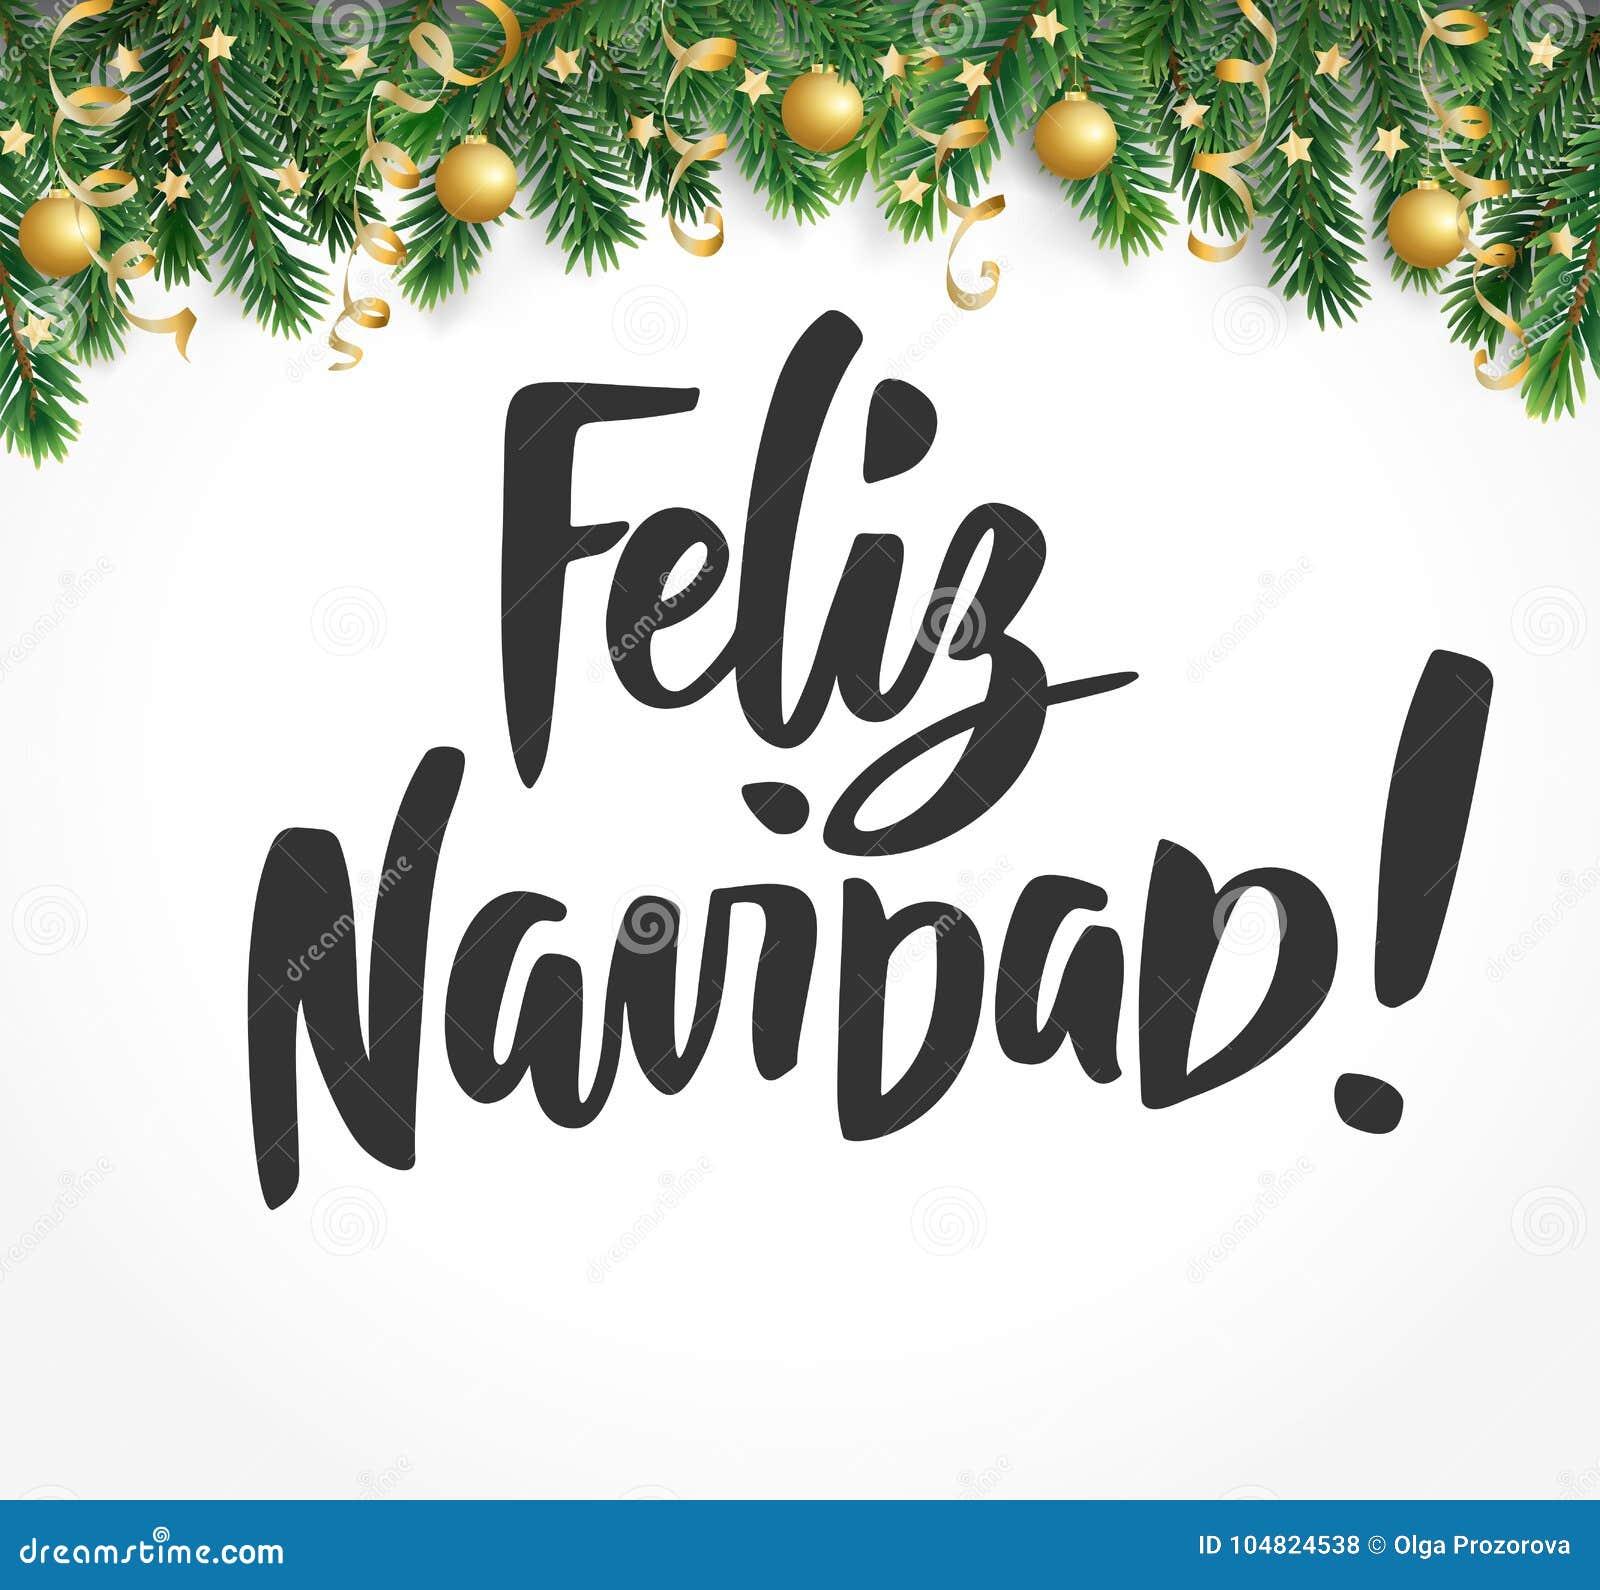 Feliz Navidad Text. Holiday Greetings Spanish Quote. Fir Tree ...